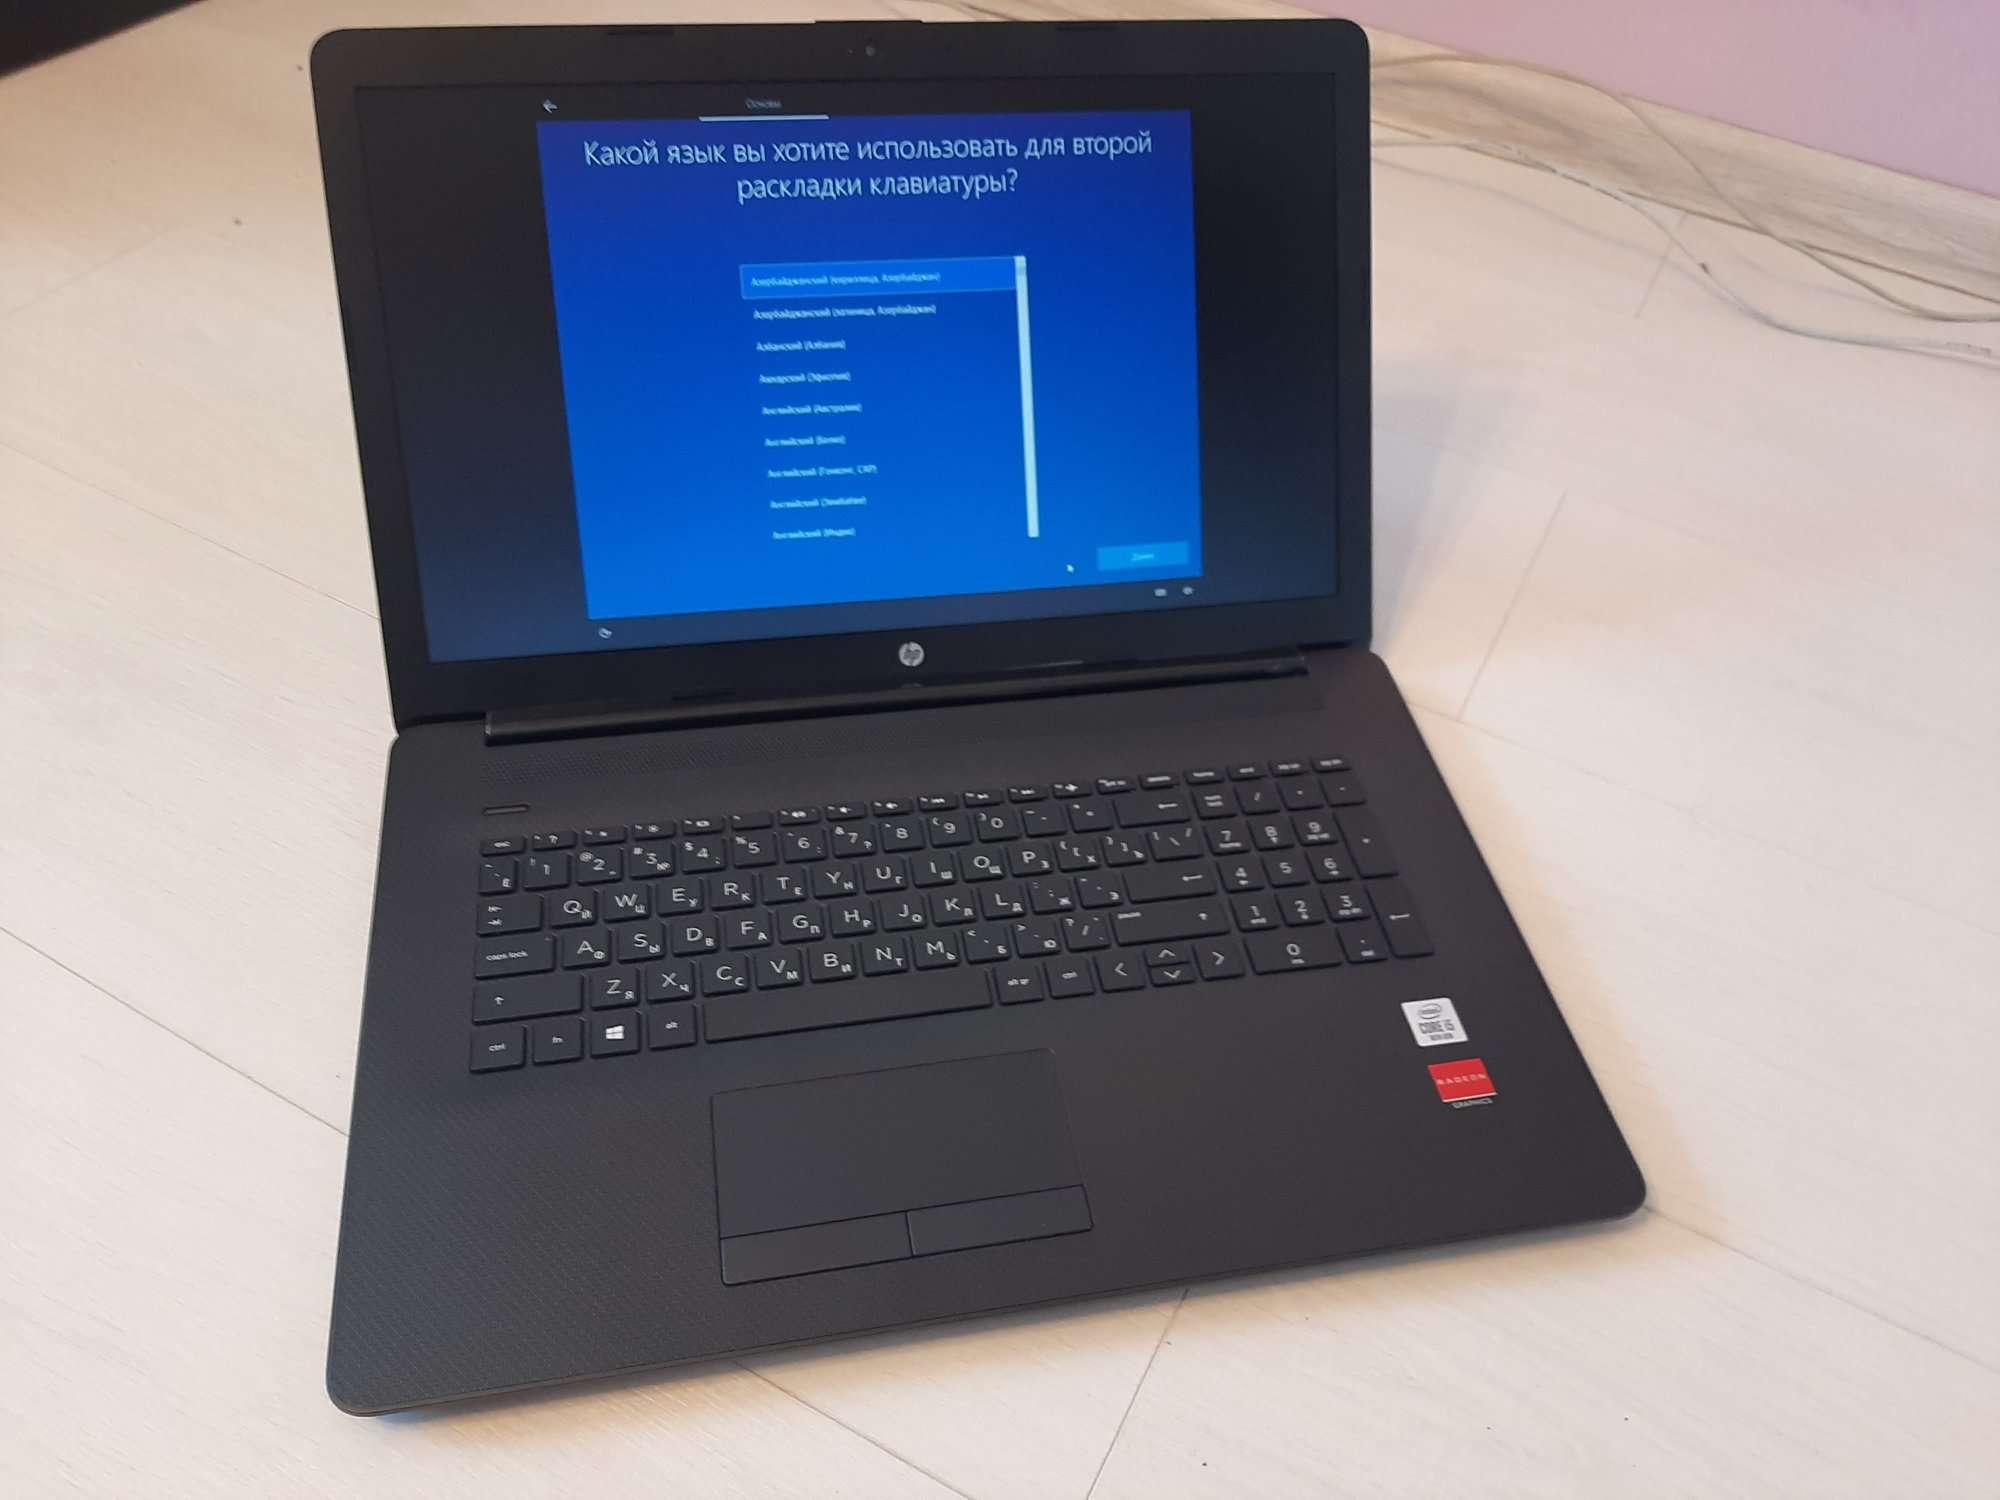 Обзор на ноутбук HP 17-by2006ur (286W0EA) - мощный и недорой ноутбук HP